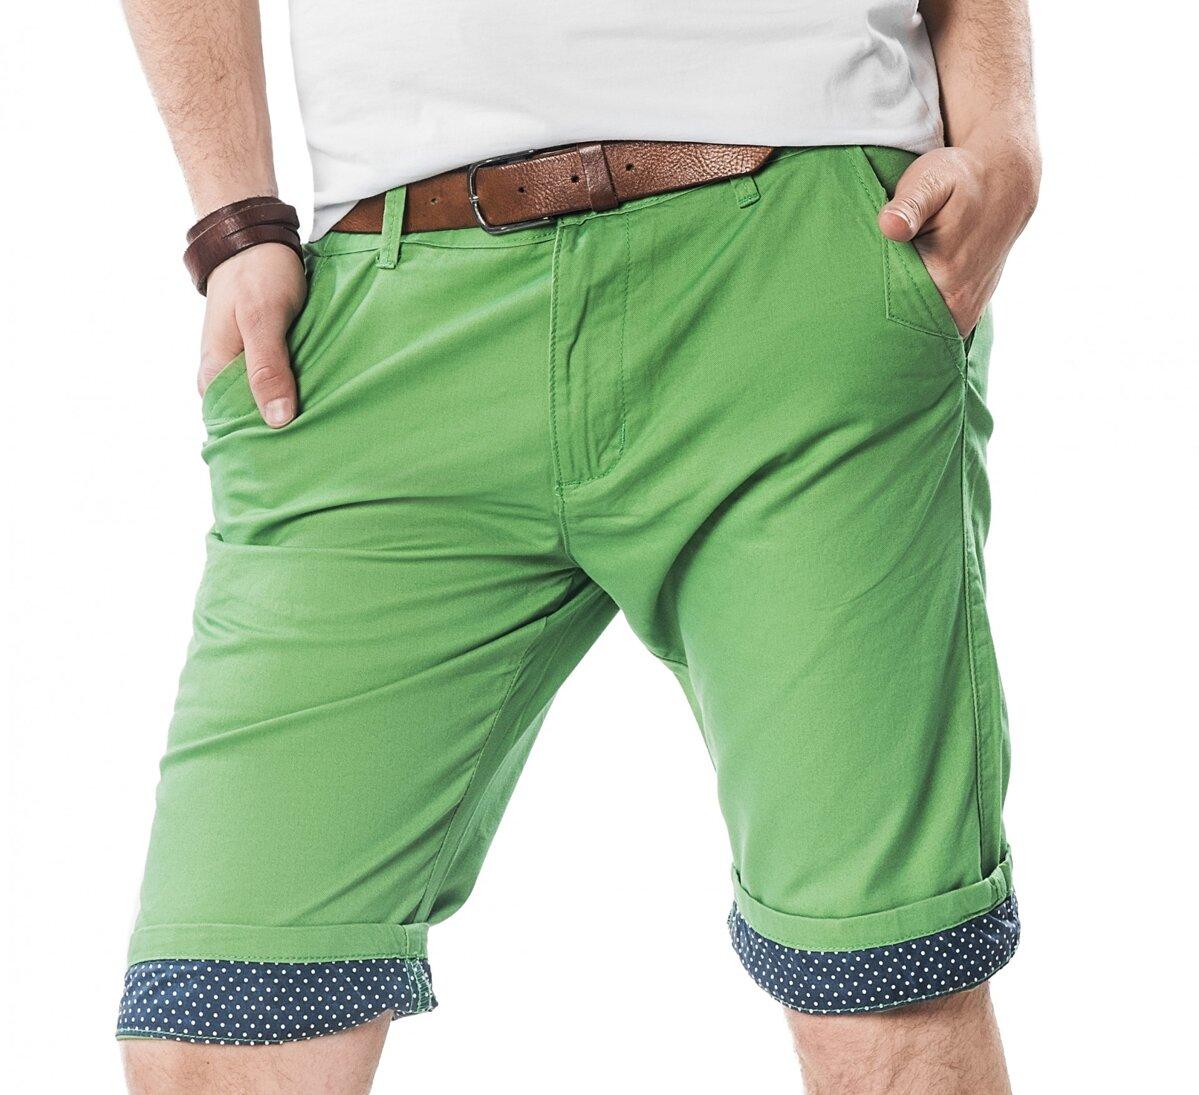 688c125fa2e27 Moderné krátke pánske nohavice SKR- 01 zelené| ModneVeci.sk